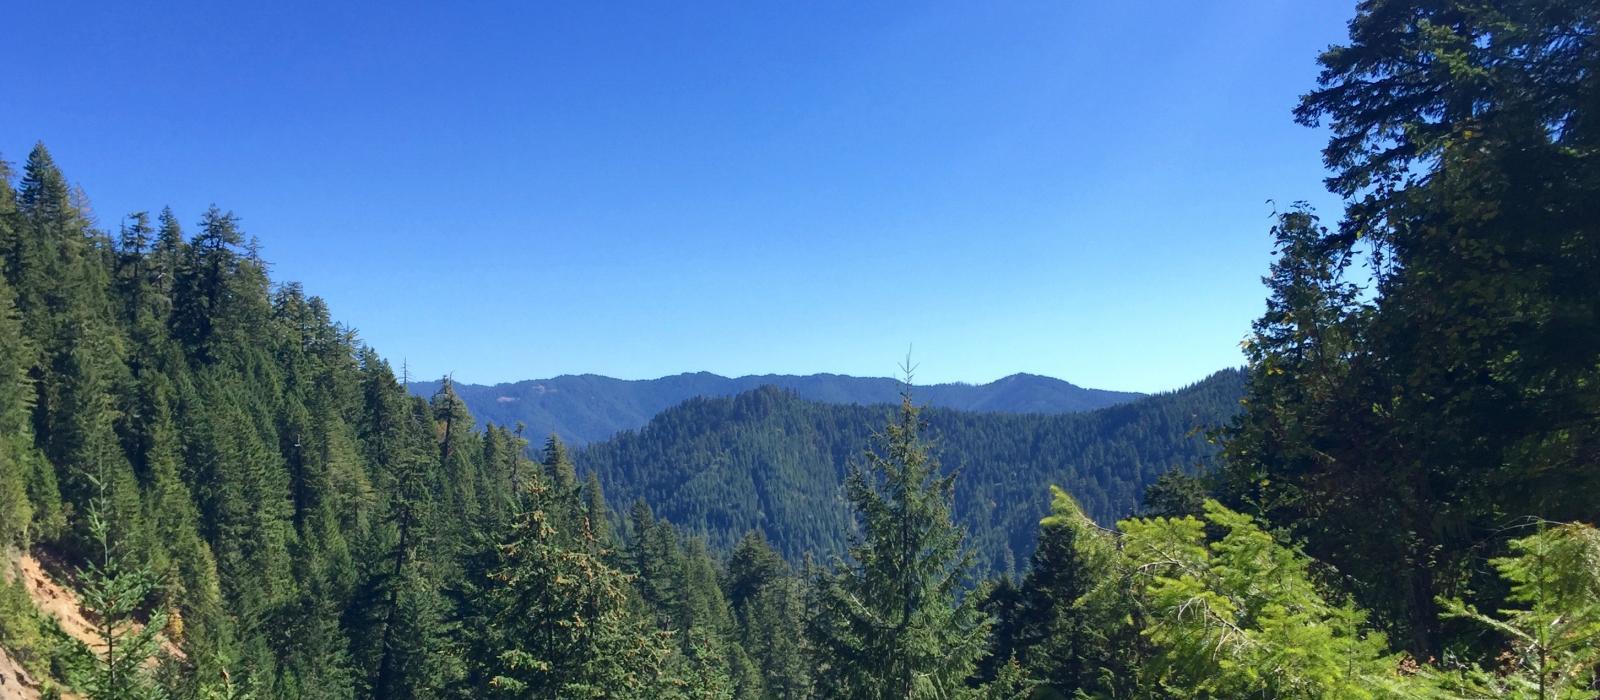 Southern Cascades